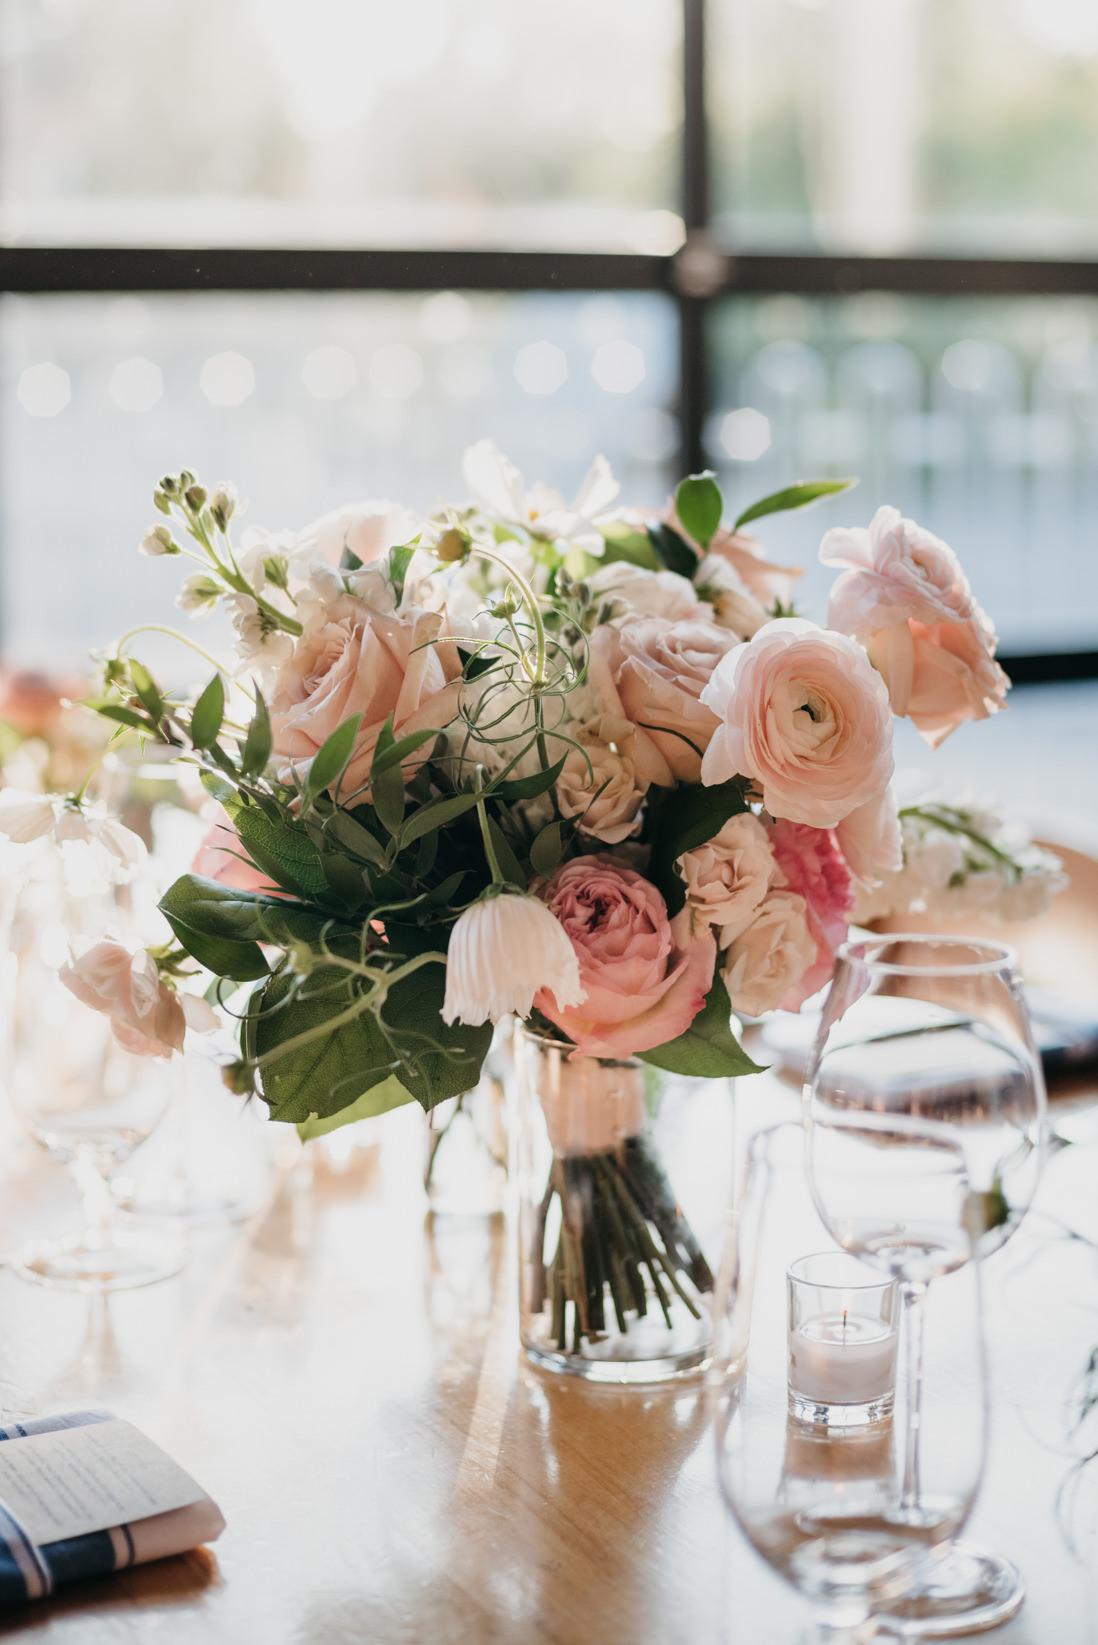 floral centerpiece wedding reception Propeller Coffee Co Wedding Toronto_EightyFifth Street Photography